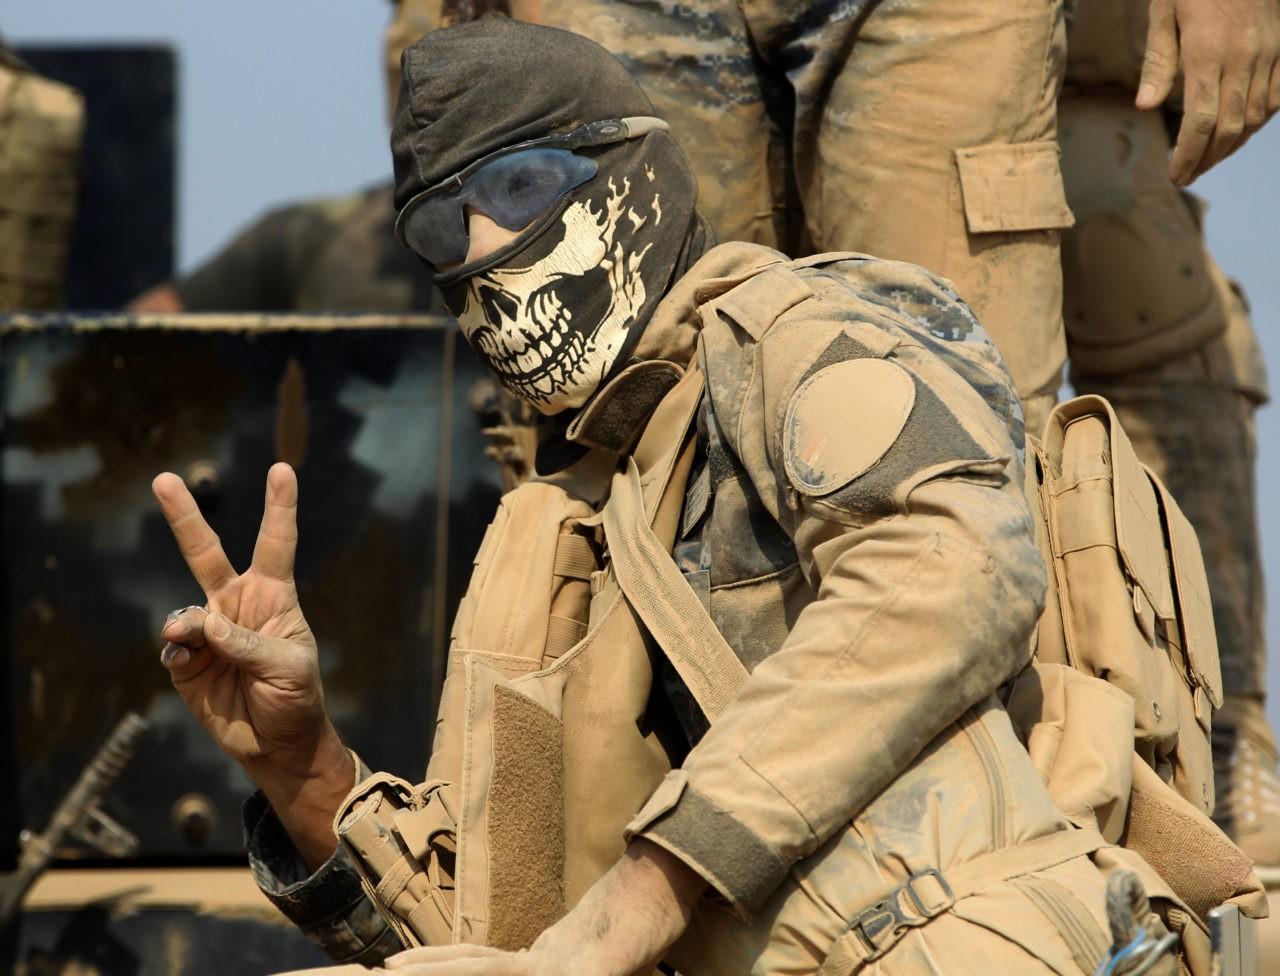 Australian Soldiers Banned from Wearing 'Arrogant' Death Symbols